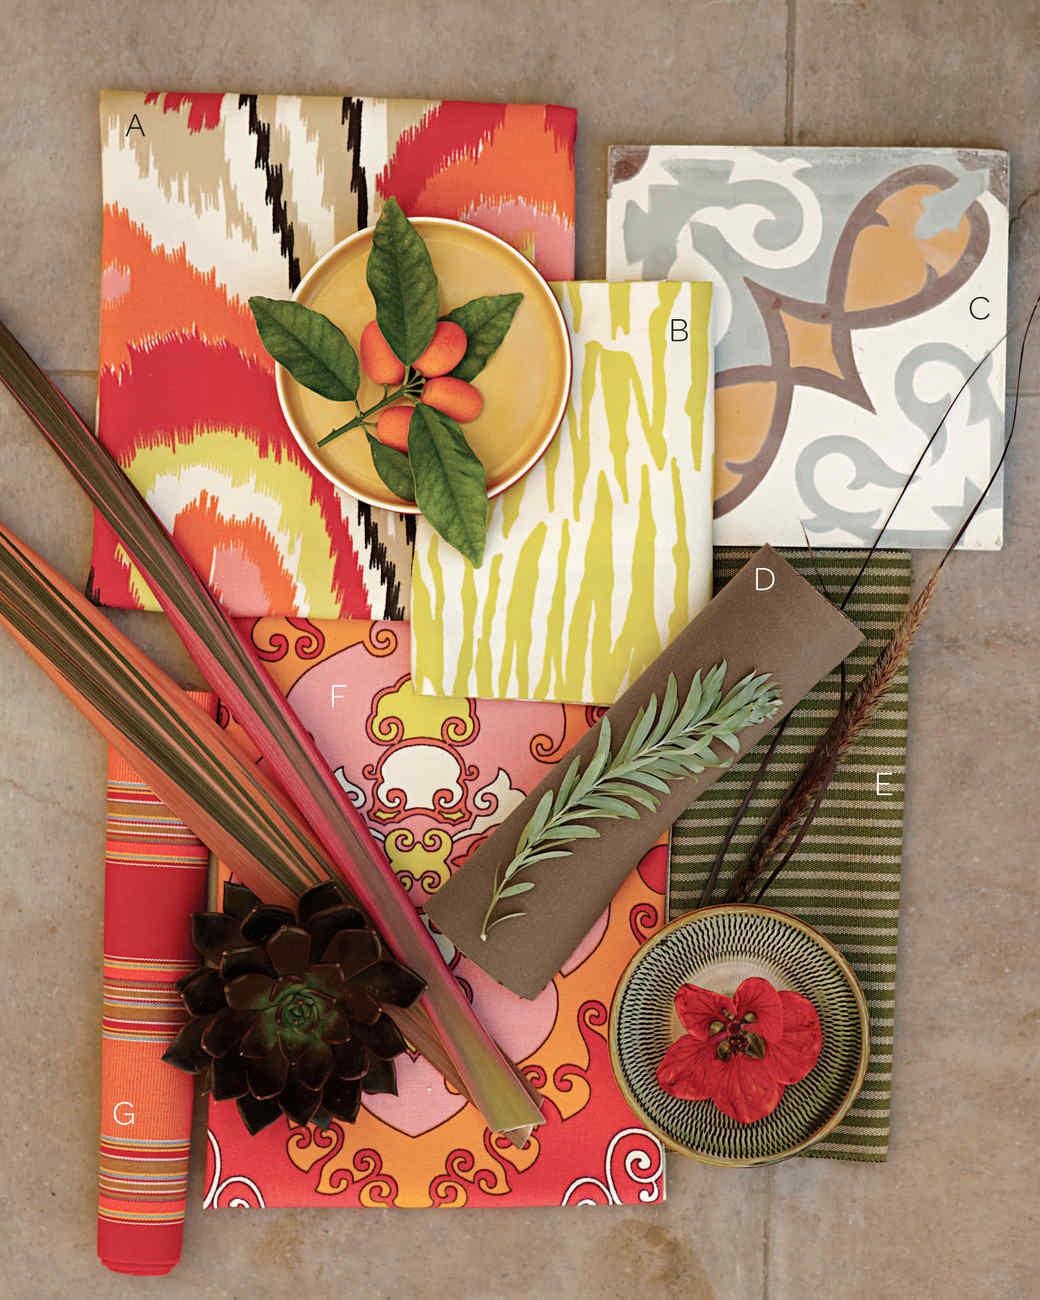 anderson-house-upholstery-0911mld107423b.jpg